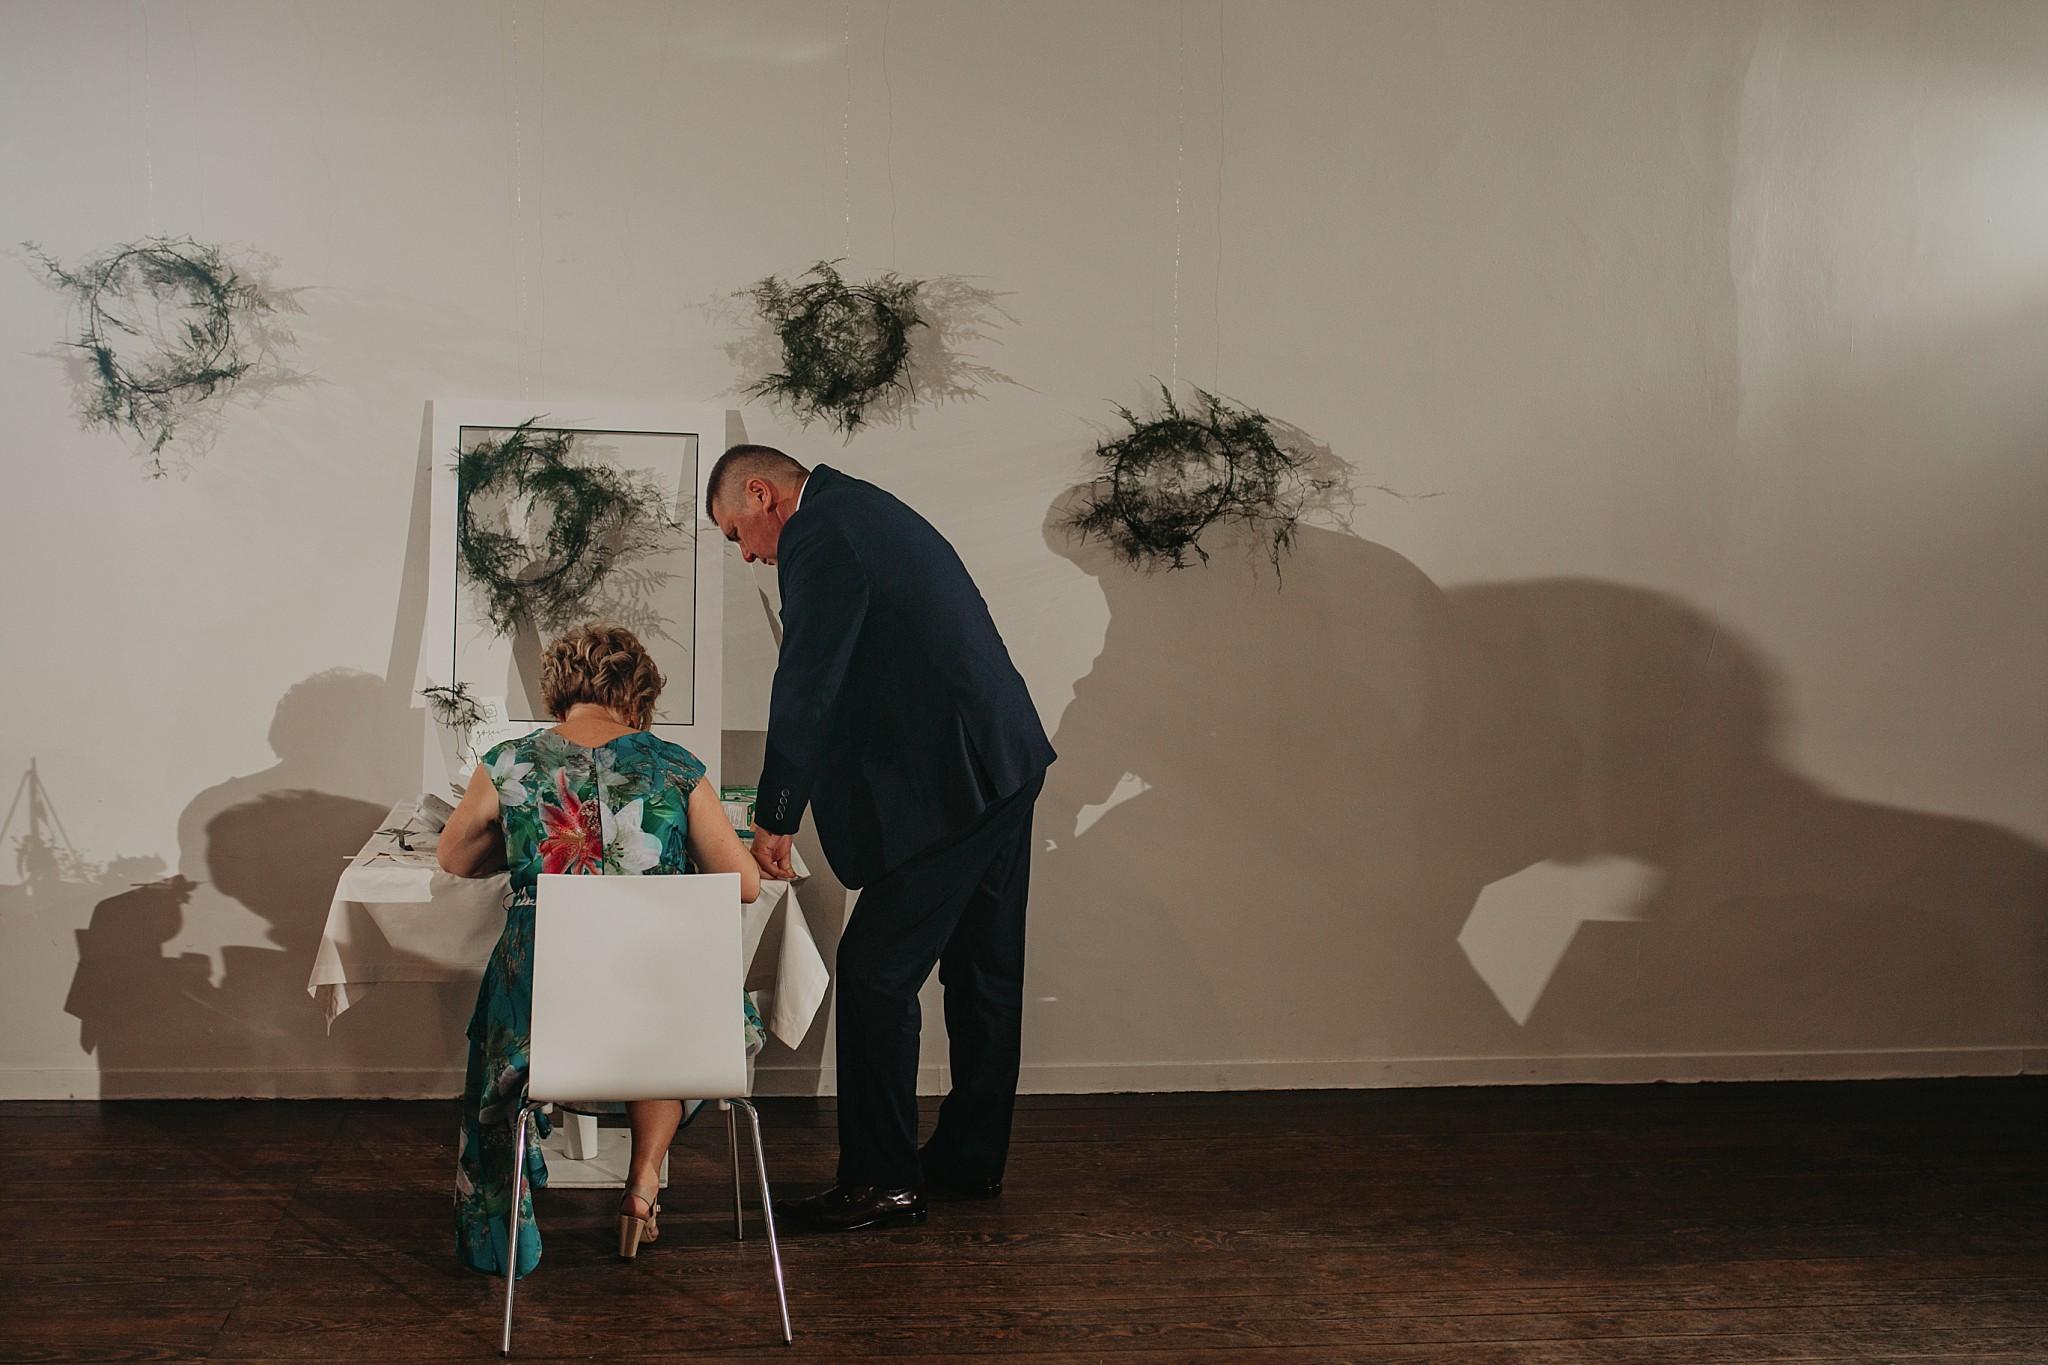 fotograf poznan wesele dobra truskawka piekne wesele pod poznaniem wesele w dobrej truskawce piekna para mloda slub marzen slub koronawirus slub listopad wesele koronawirus 488